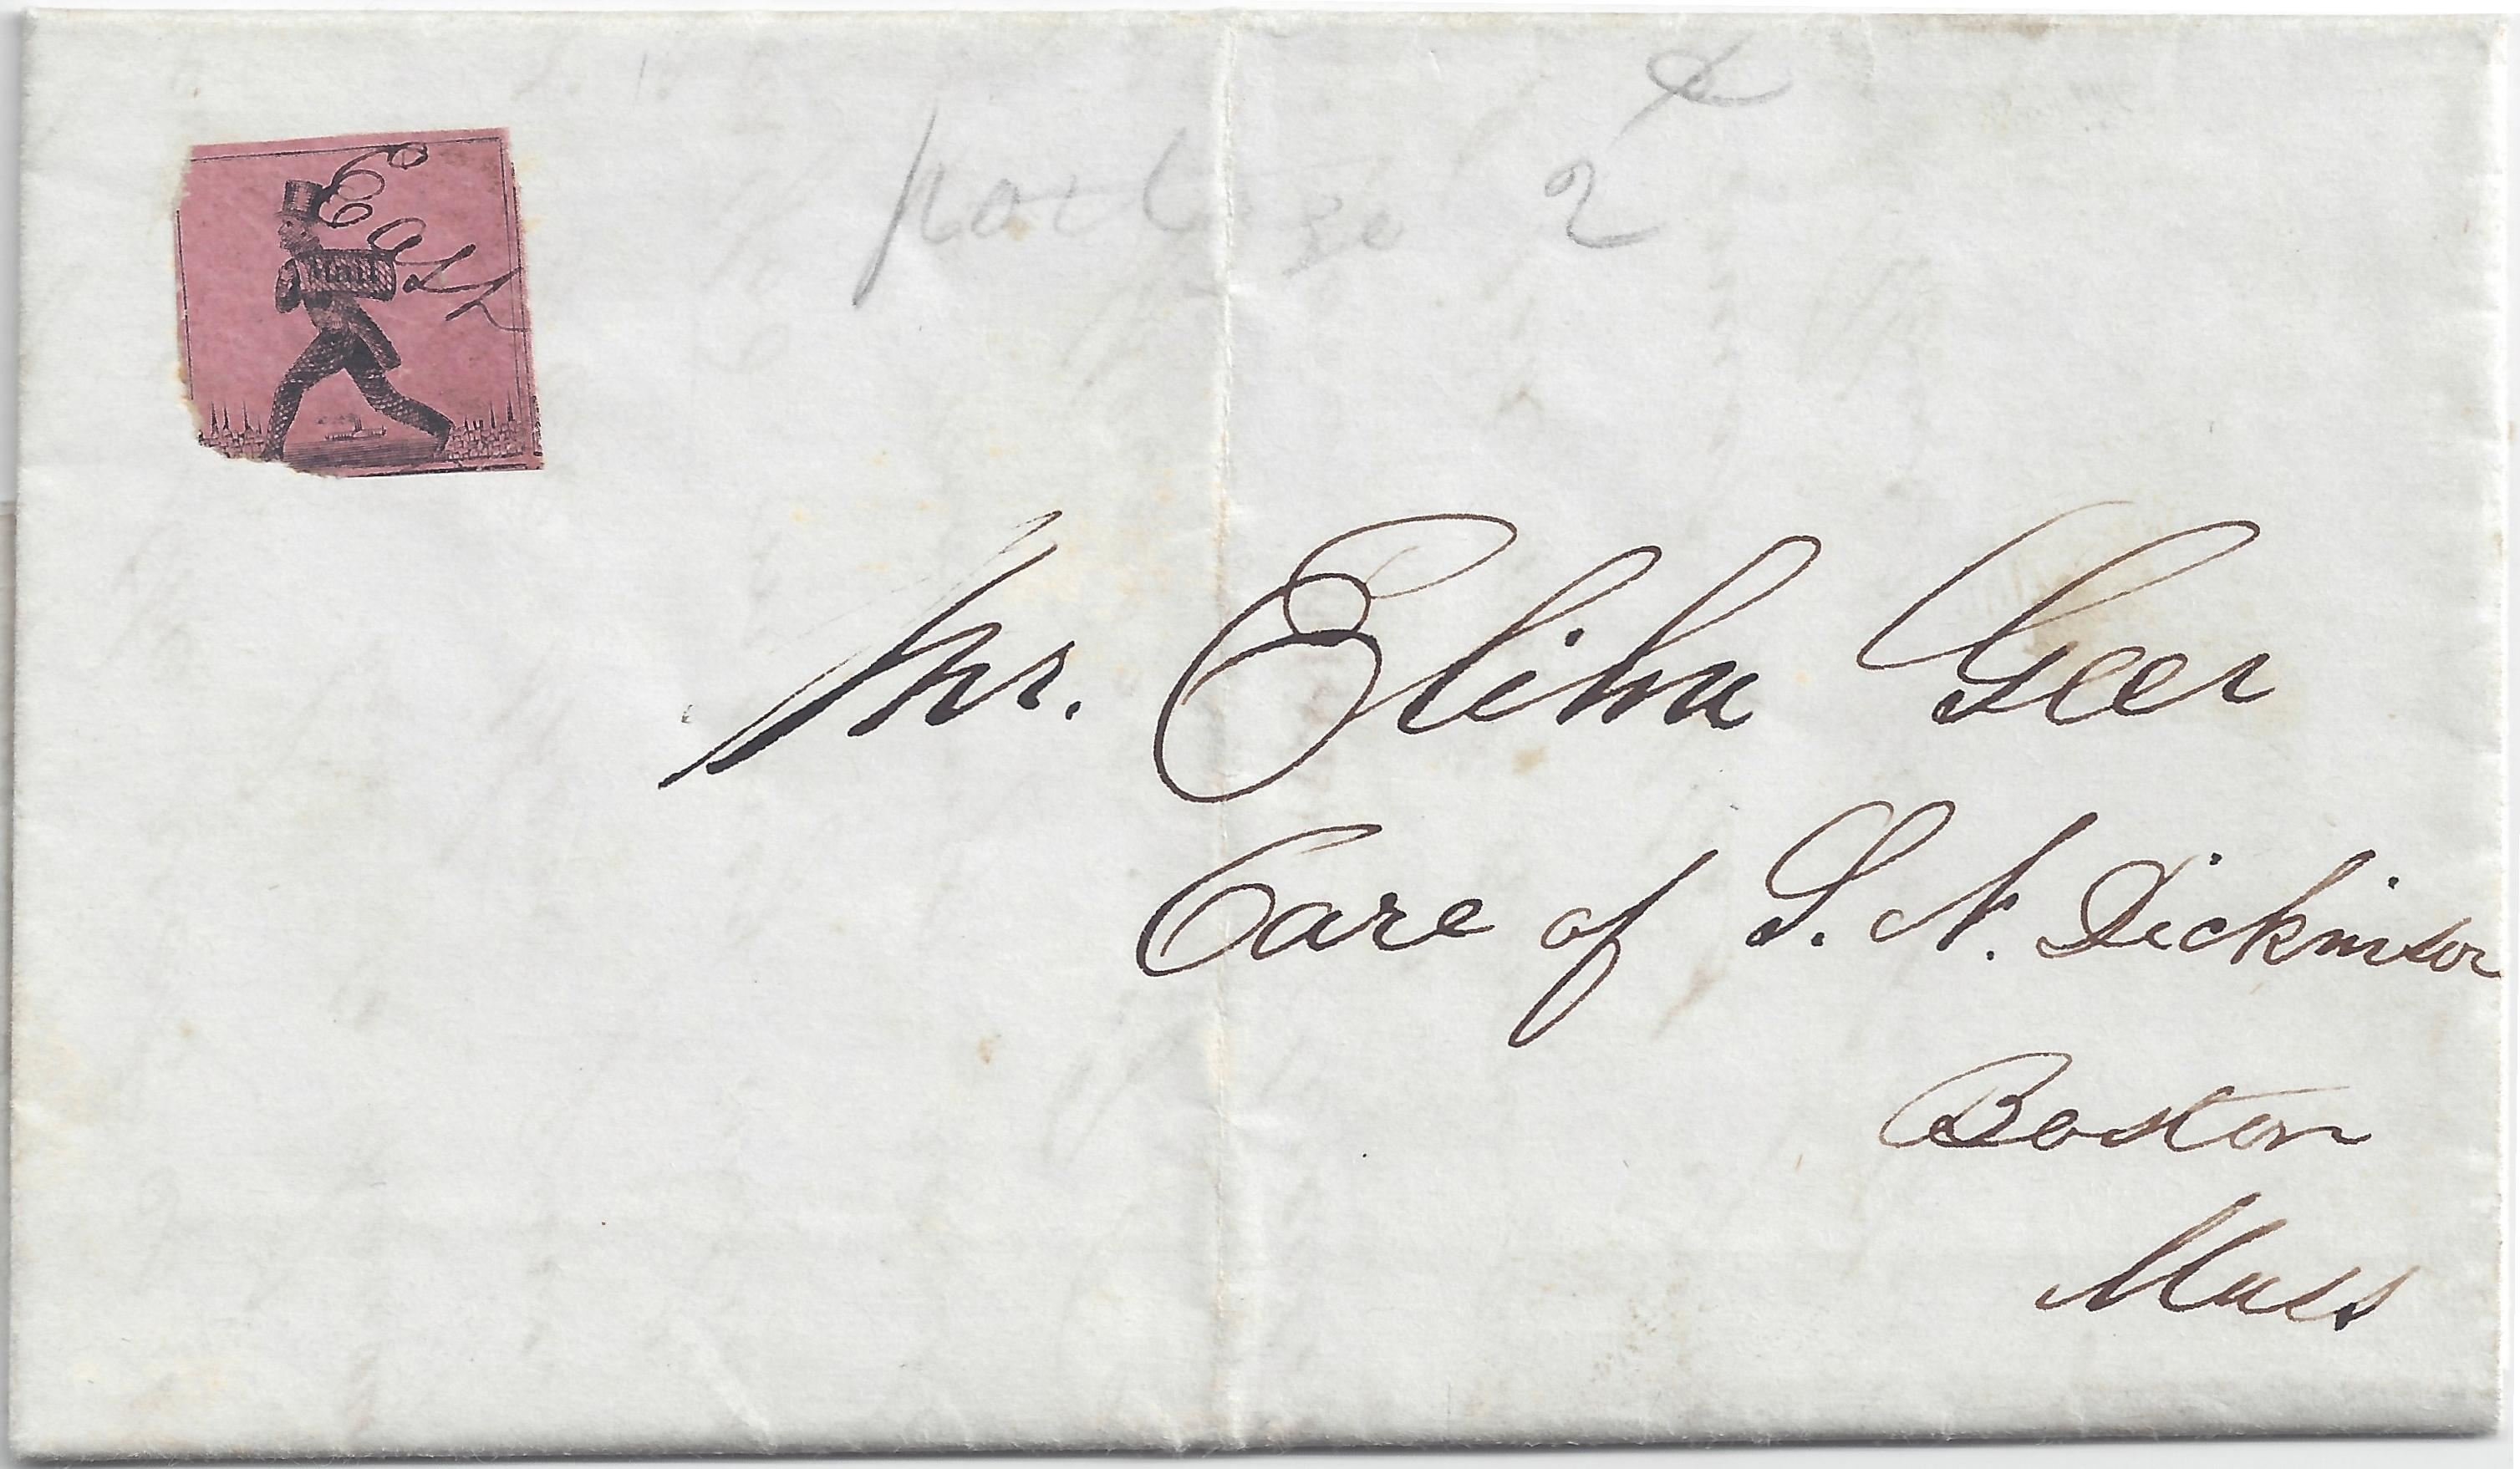 Hartford Letter Mail